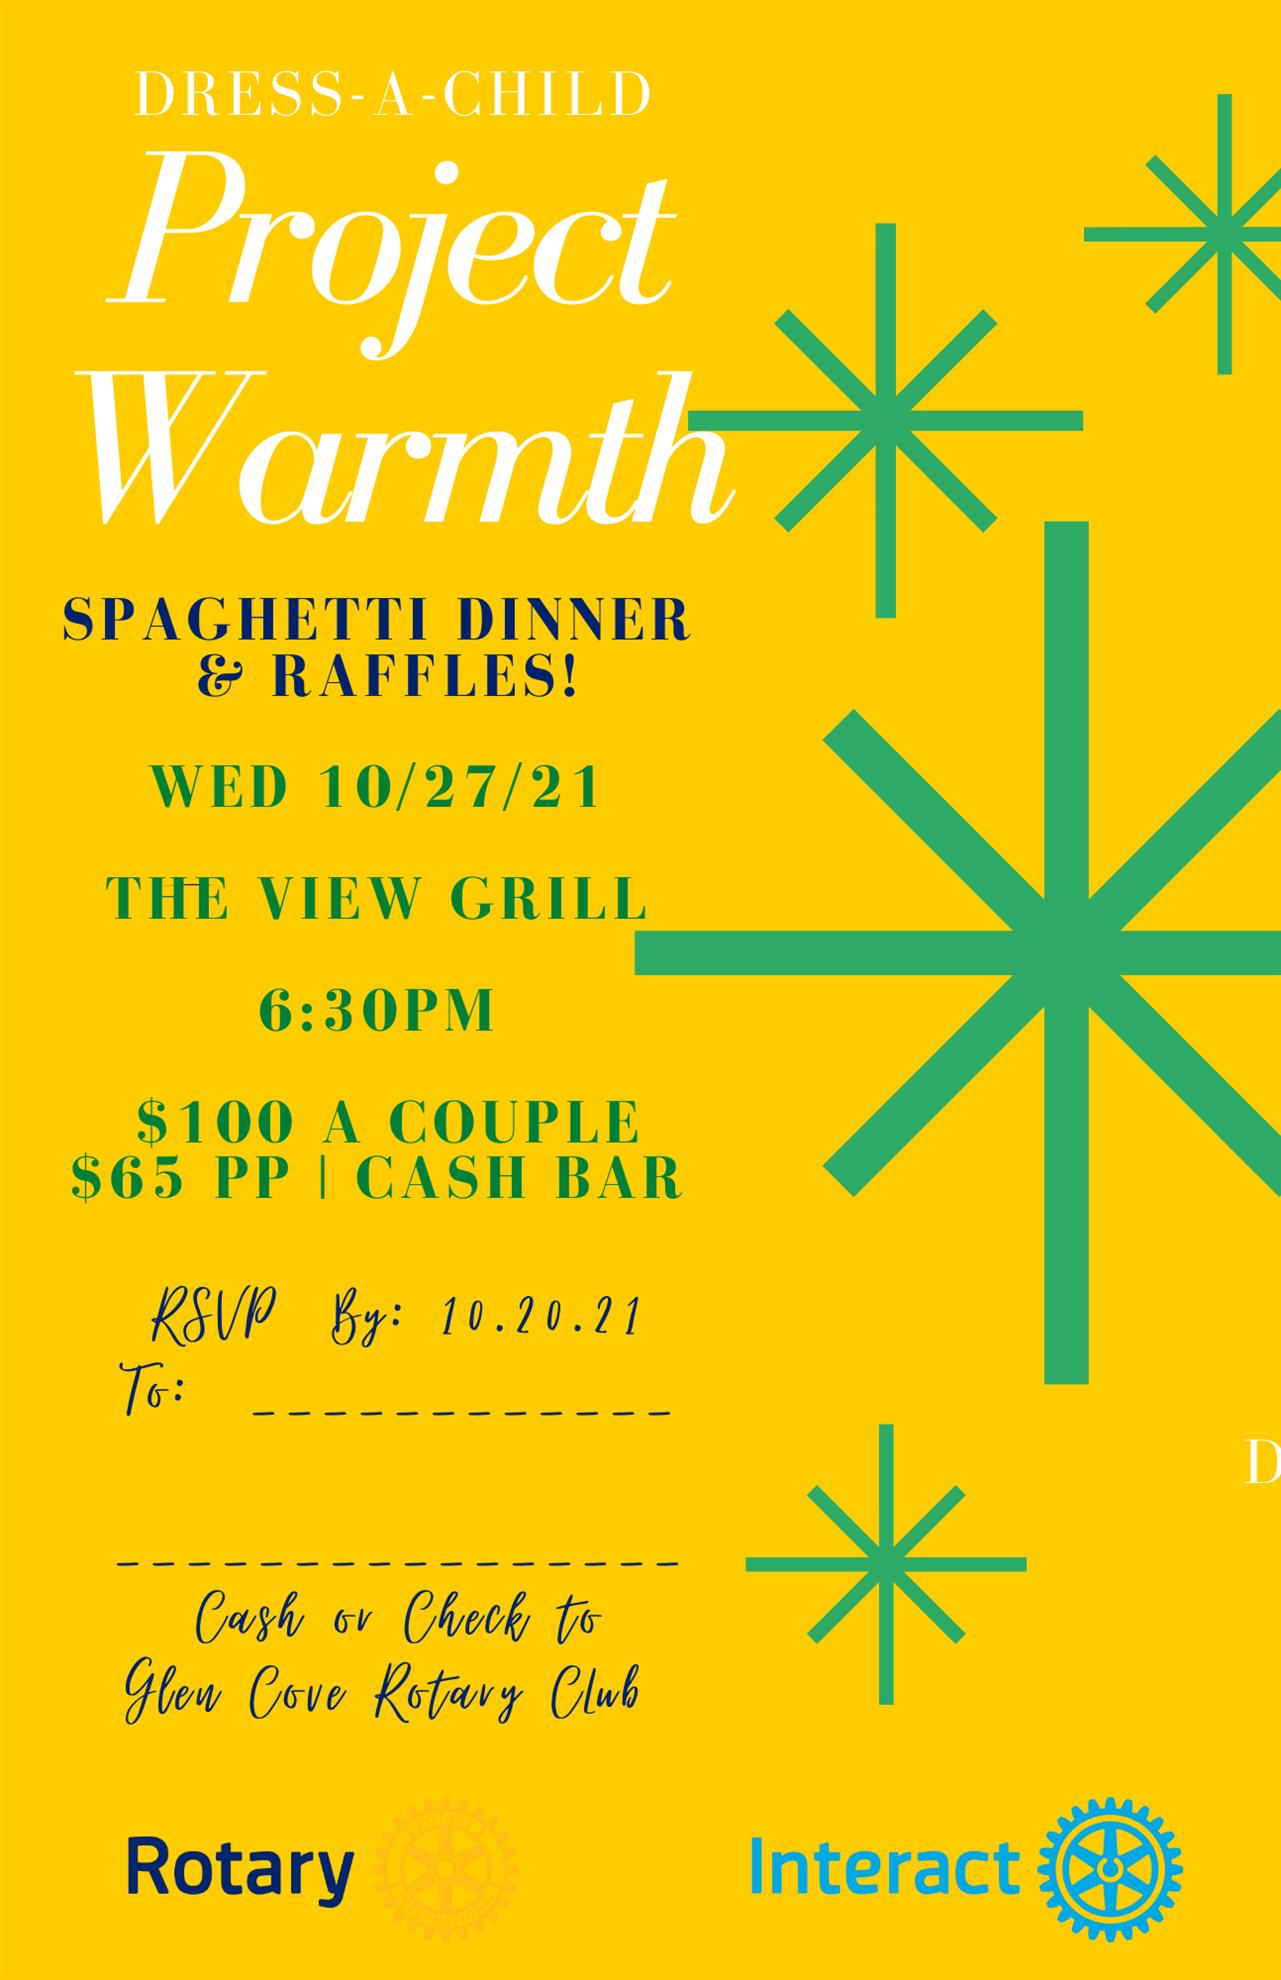 Dress-A-Child Spaghetti Dinner